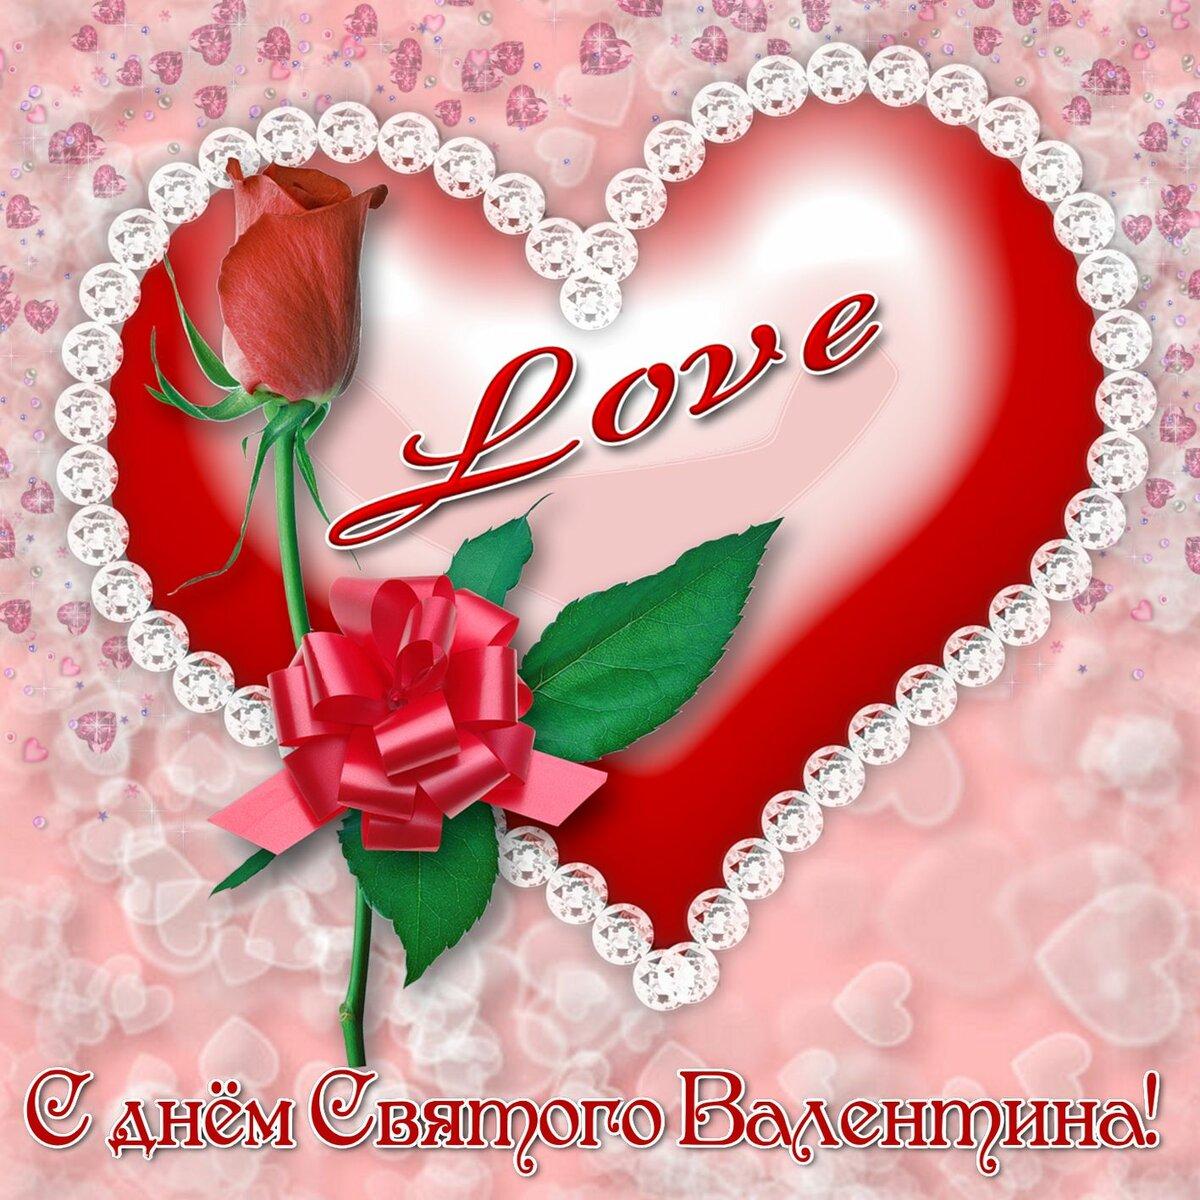 С днем святого валентина картинки с поздравлениями